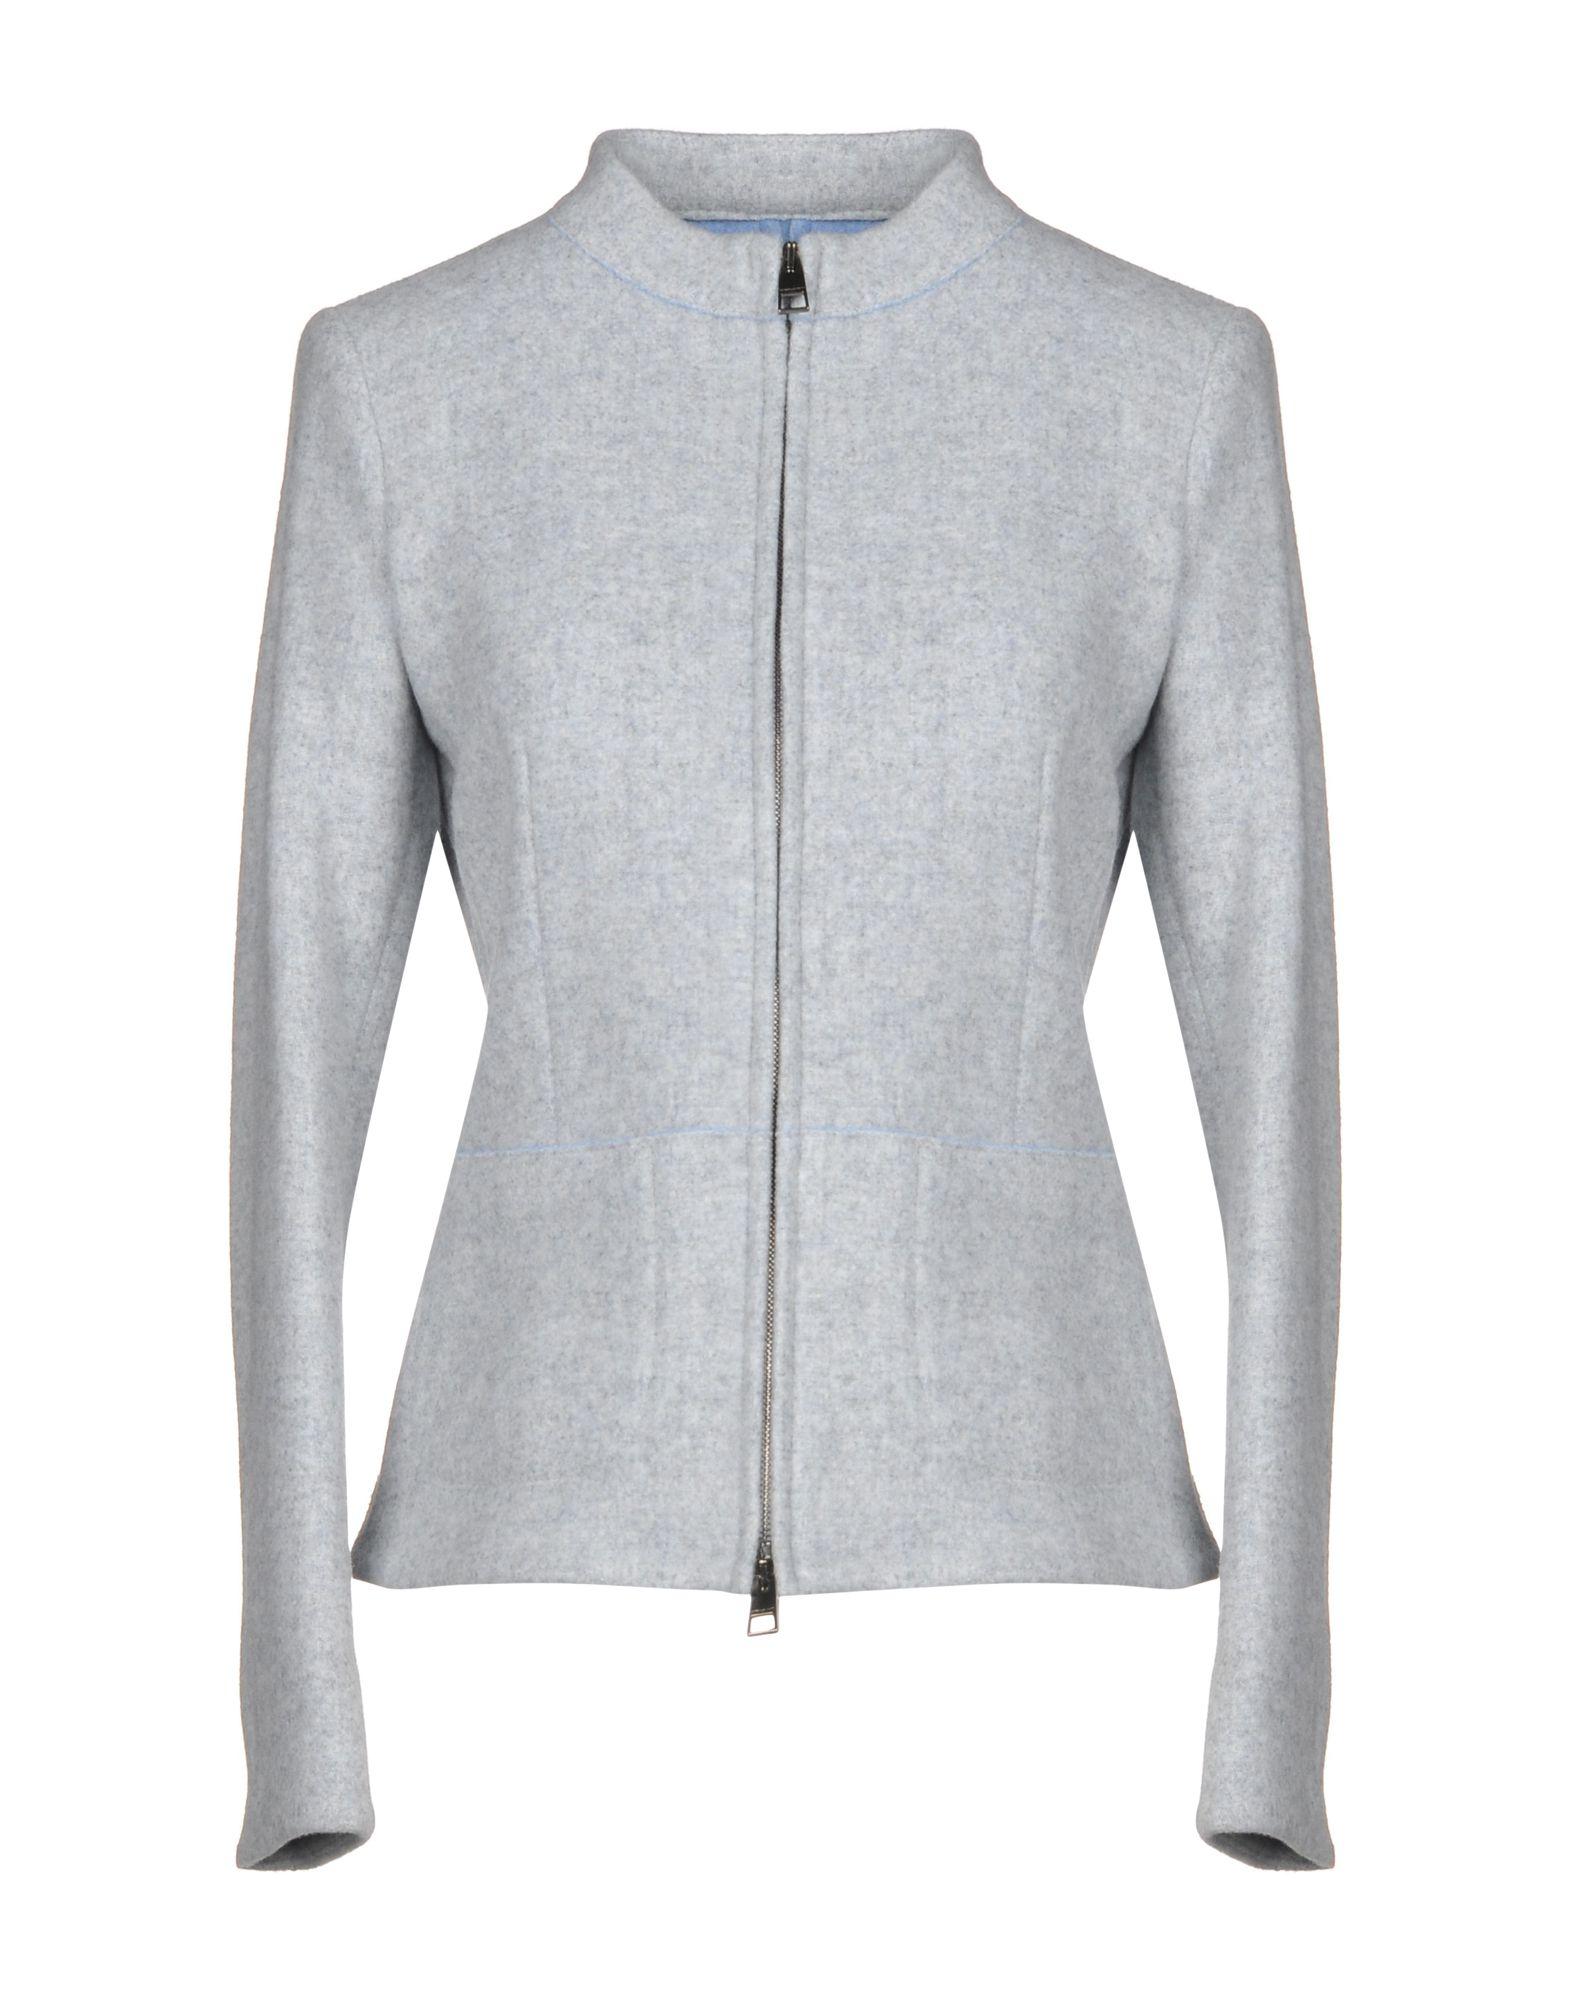 VIOLANTI Blazer in Light Grey